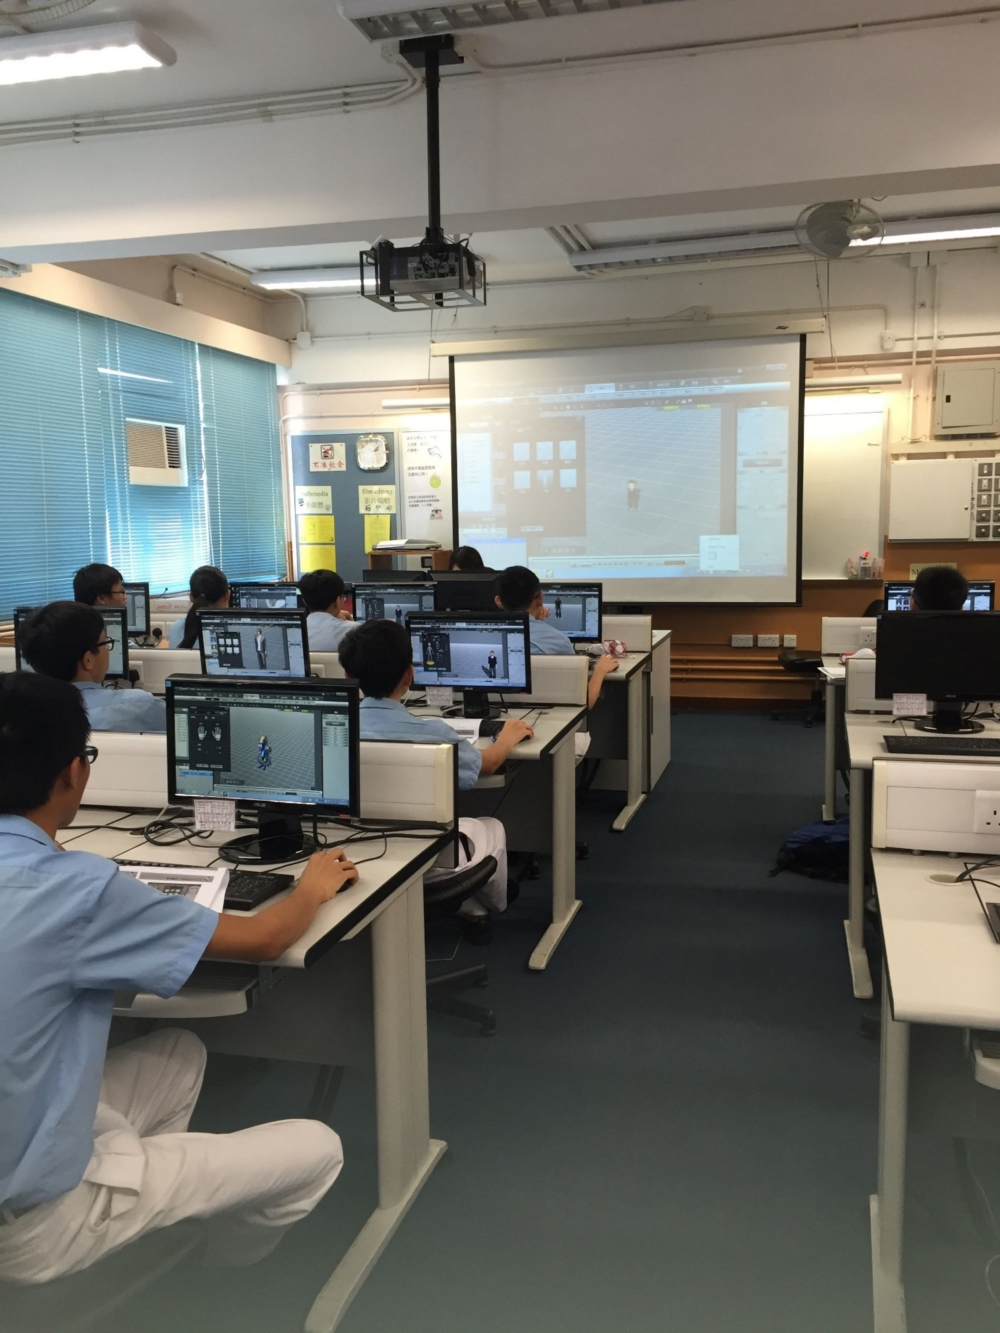 http://www.npc.edu.hk/sites/default/files/2_1224.jpg